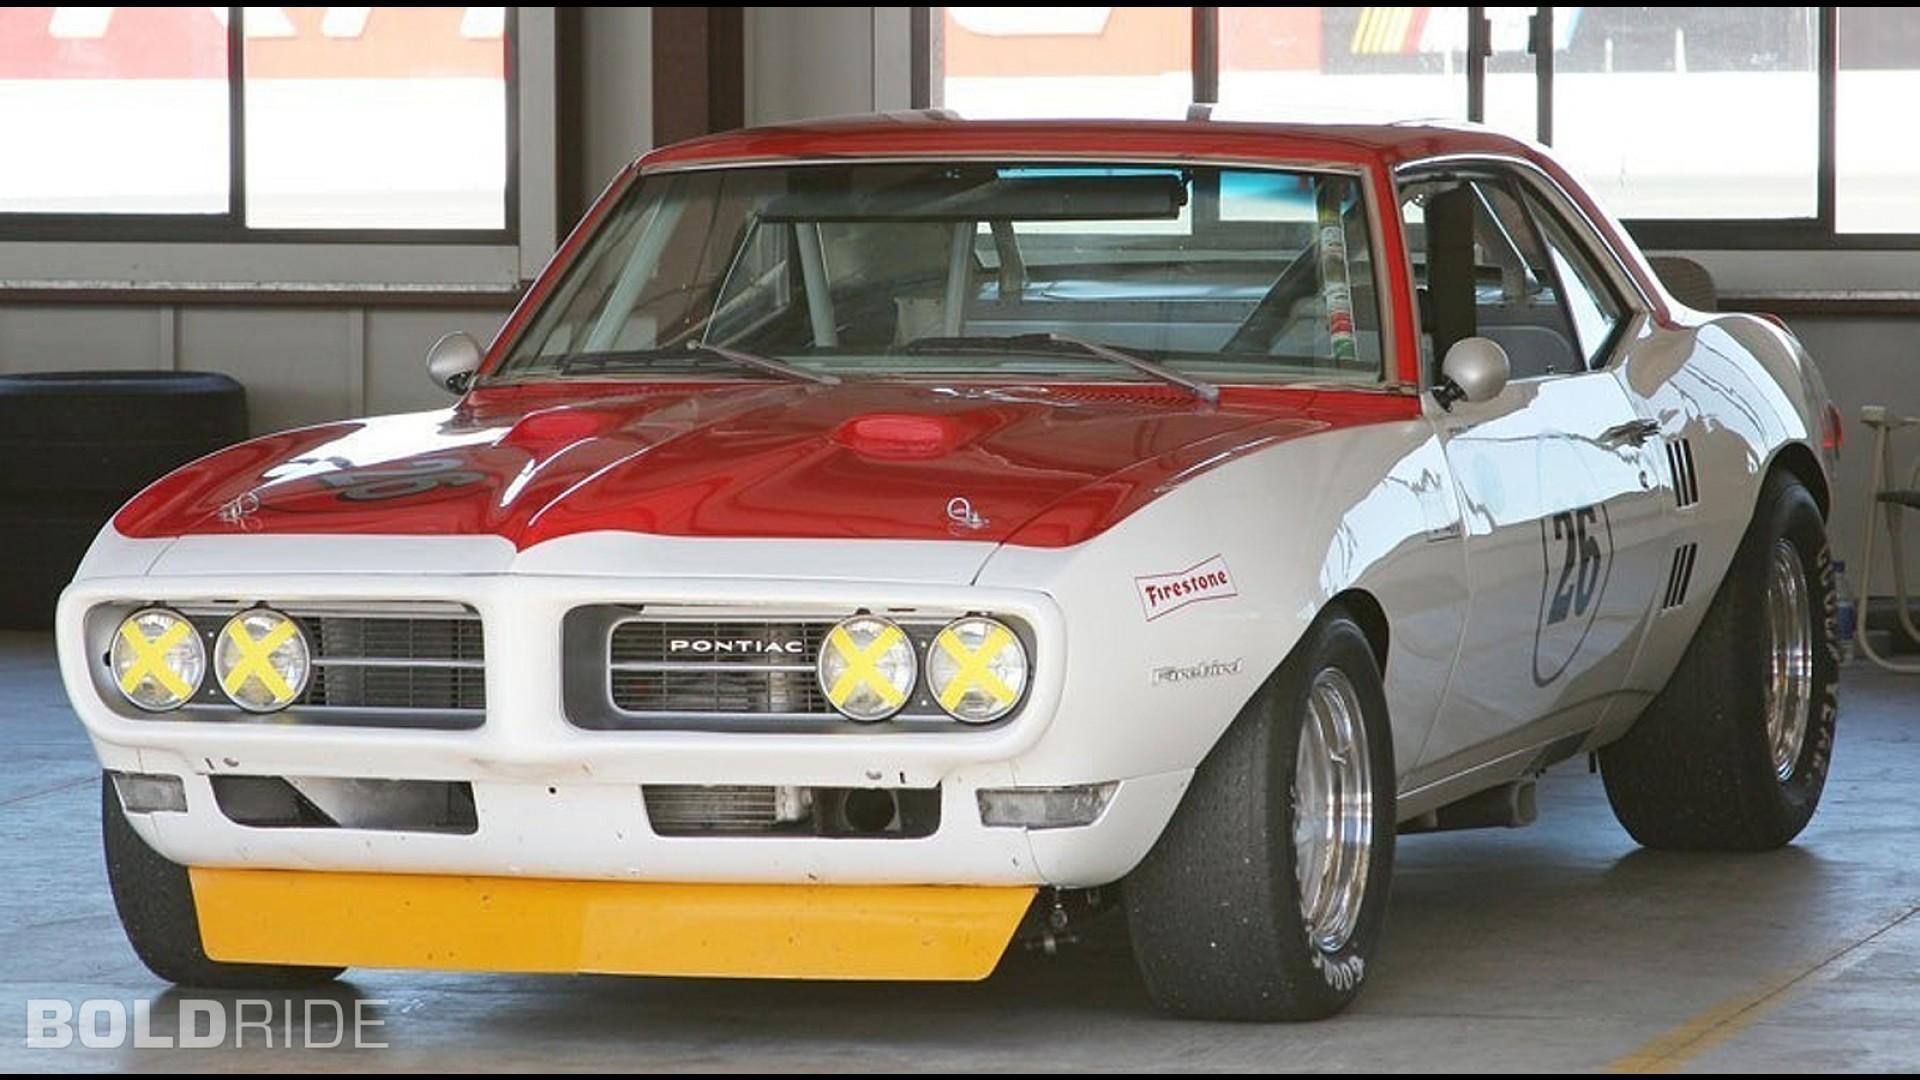 pontiac firebird titus trans am race car. Black Bedroom Furniture Sets. Home Design Ideas